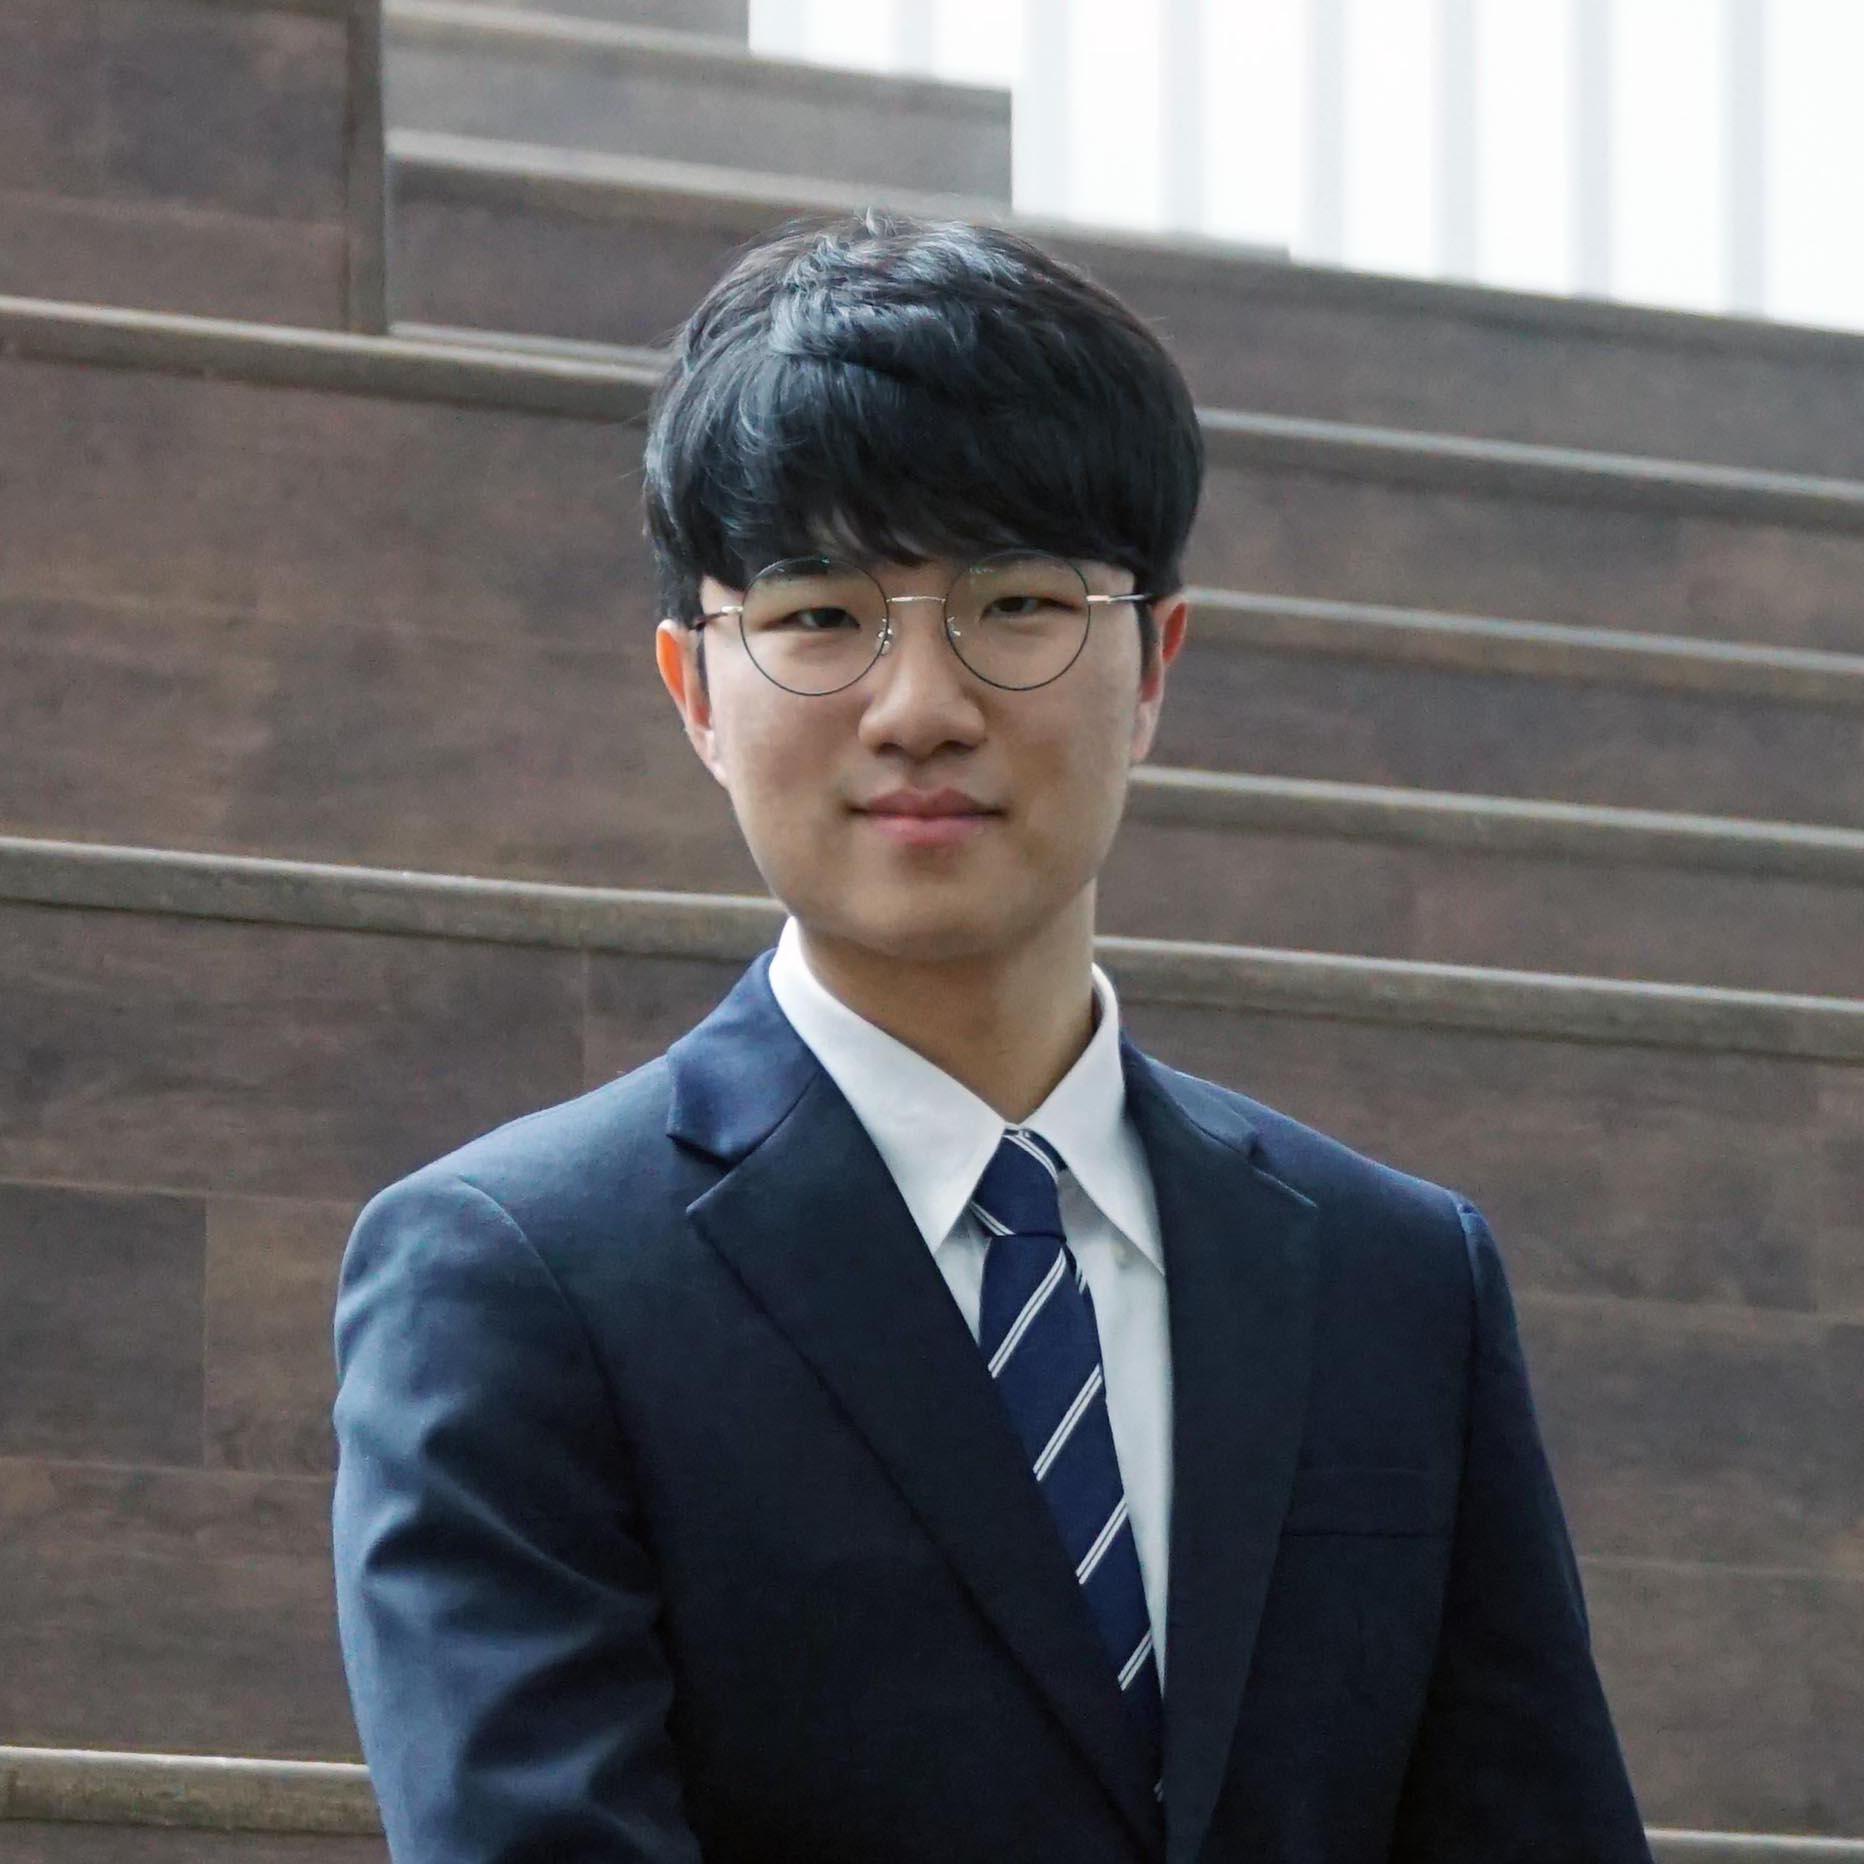 Head: Youngjun Song